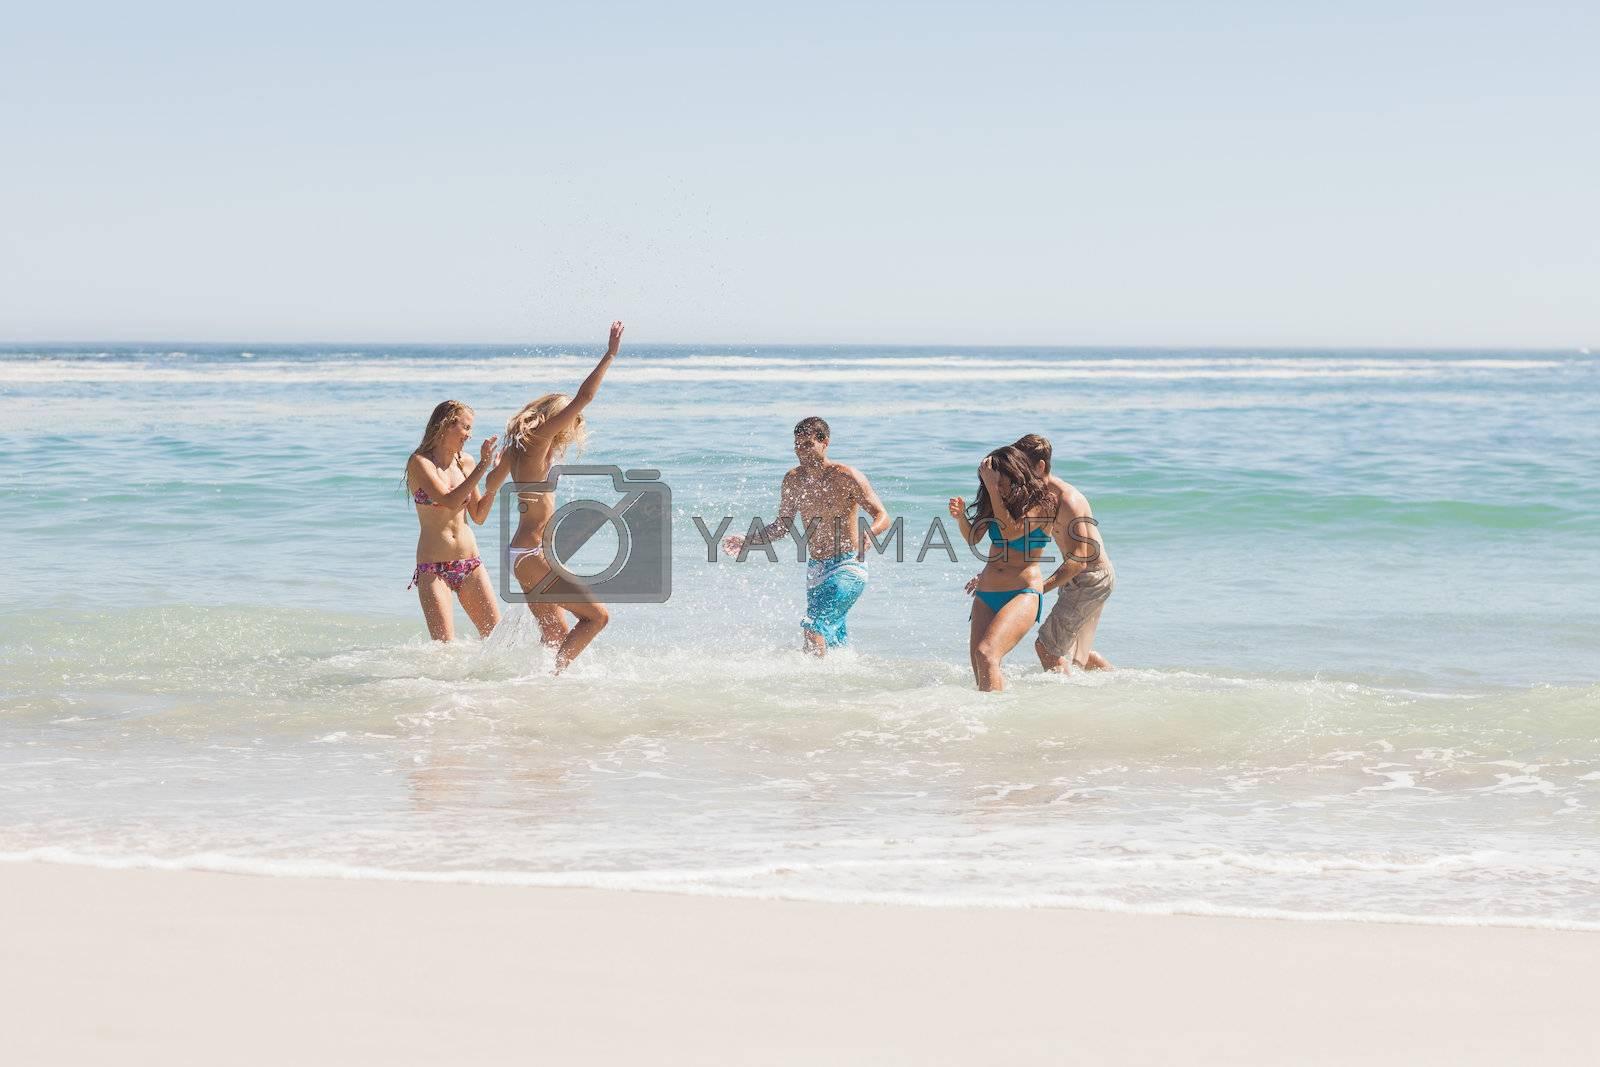 Group of friends having fun on the beach by Wavebreakmedia